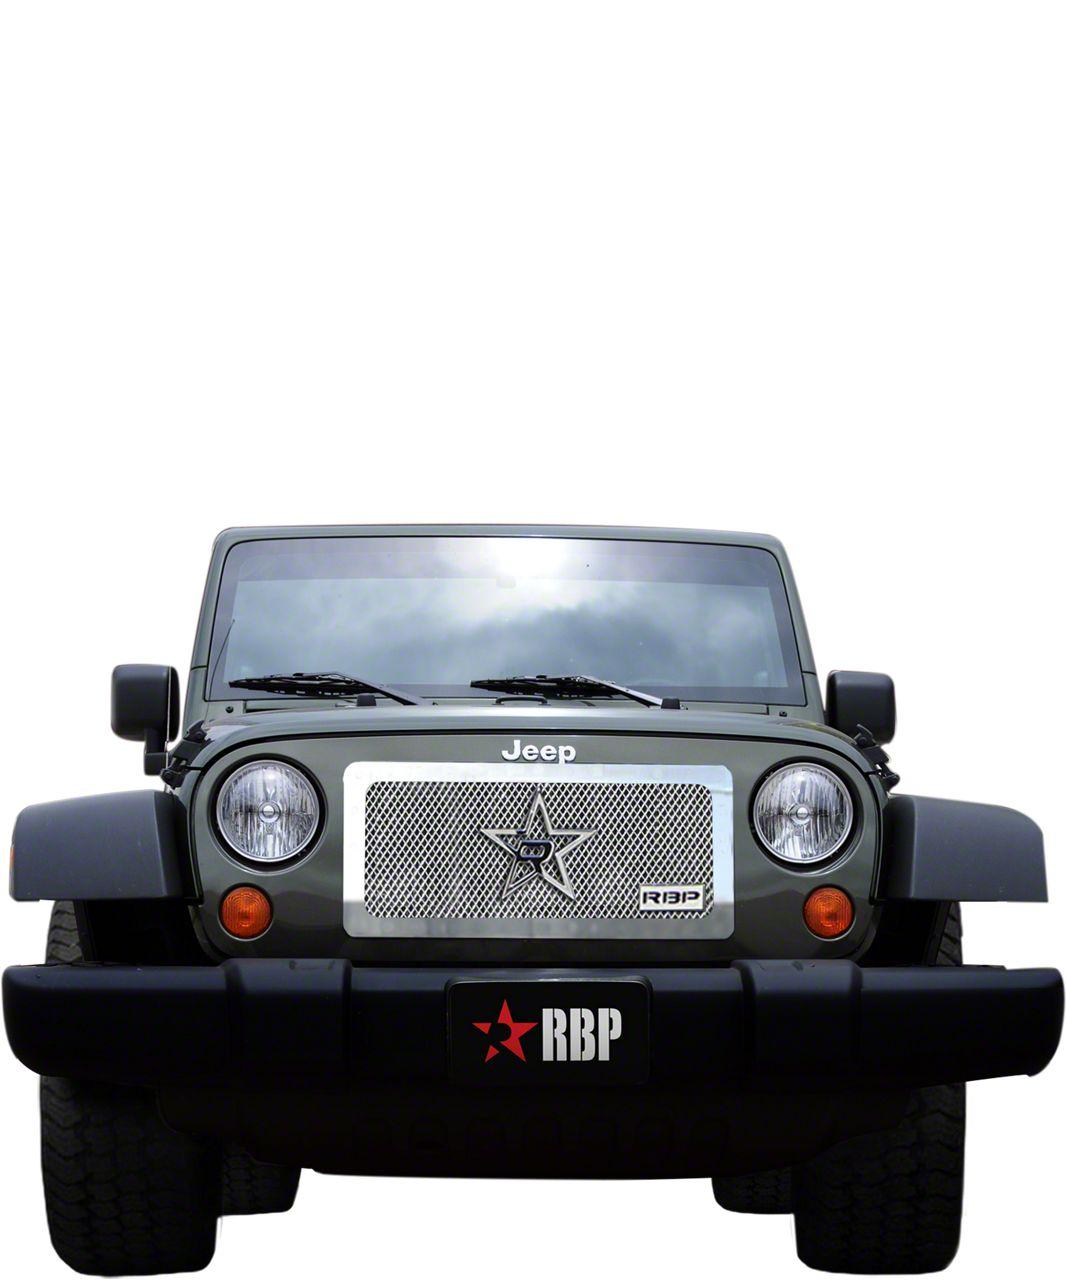 RBP RL Series Smooth Frame Grille - Chrome (97-06 Jeep Wrangler TJ)